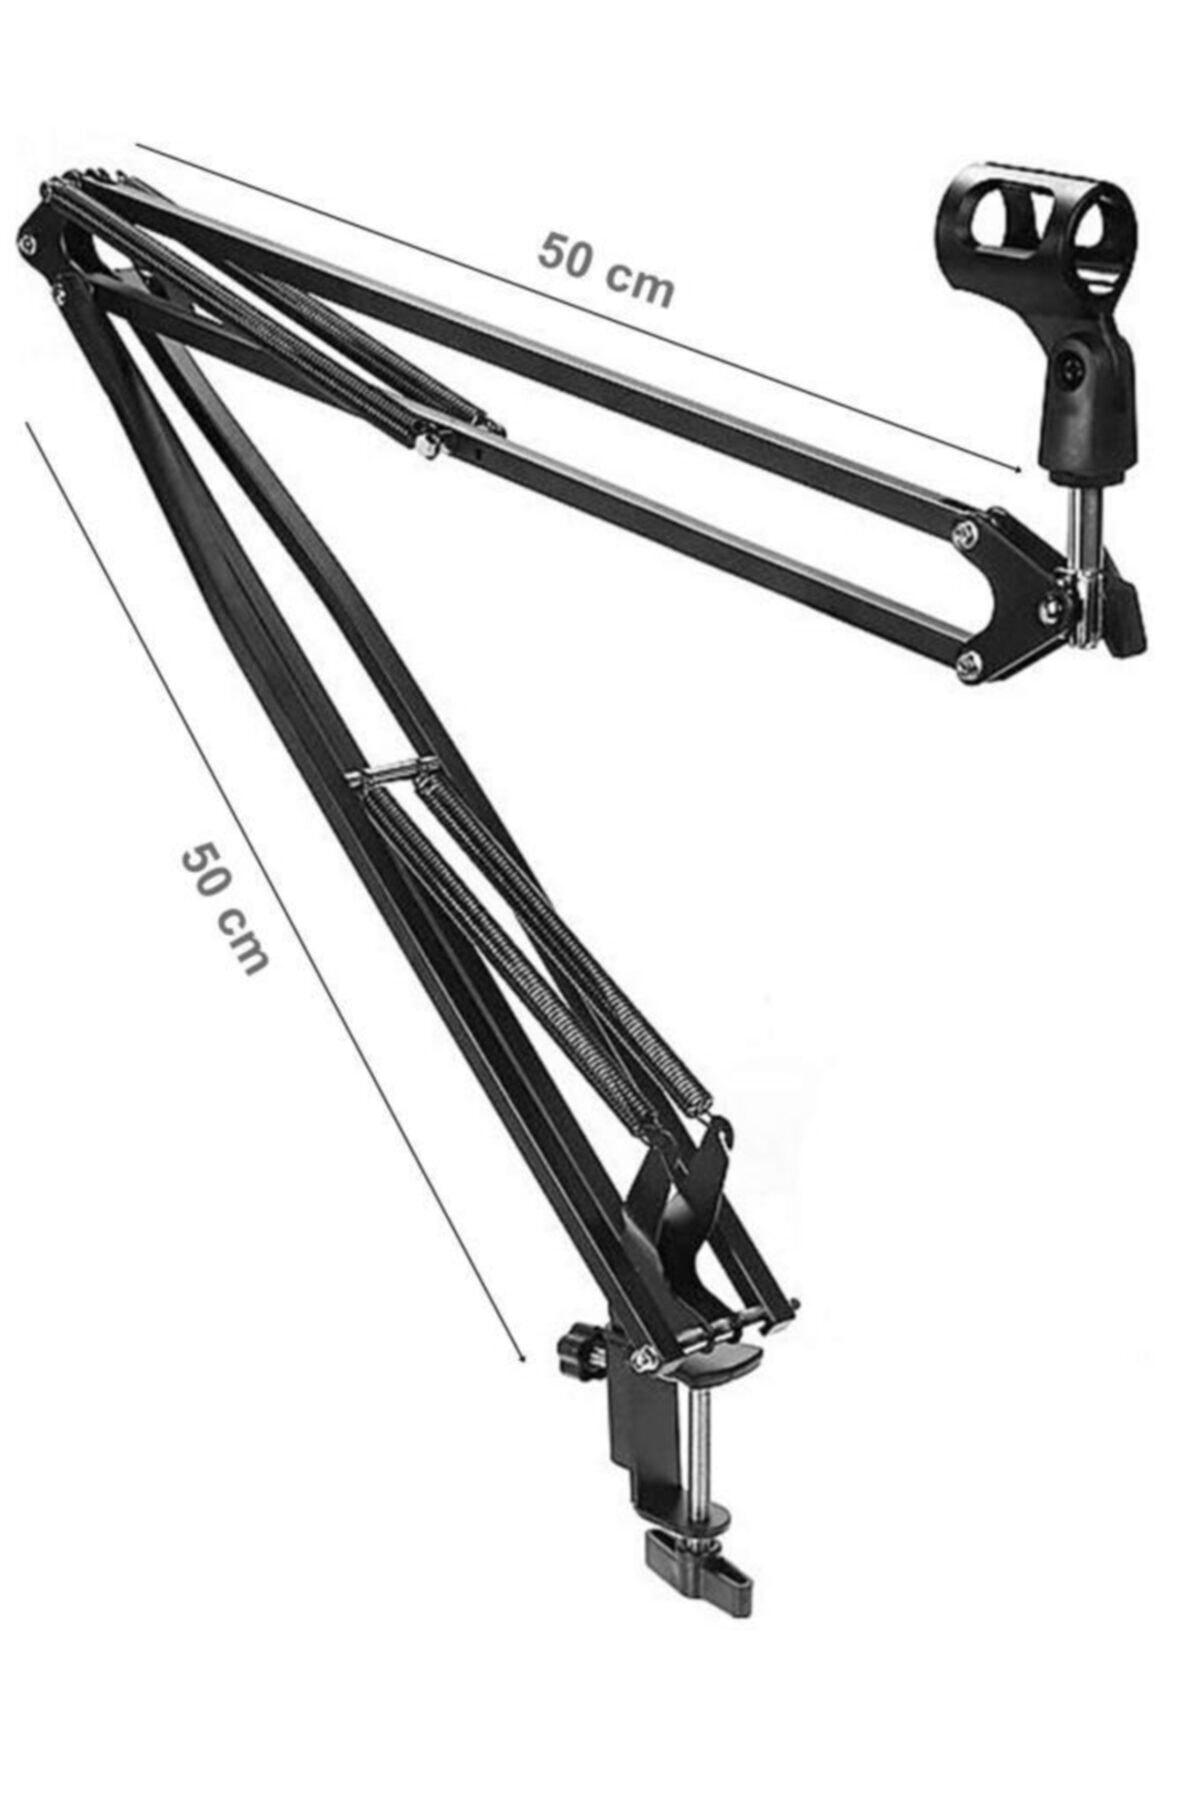 Lastvoice Nb40 Stüdyo Masa Mikrofon Standı (50x50 Büyük Boy) 2